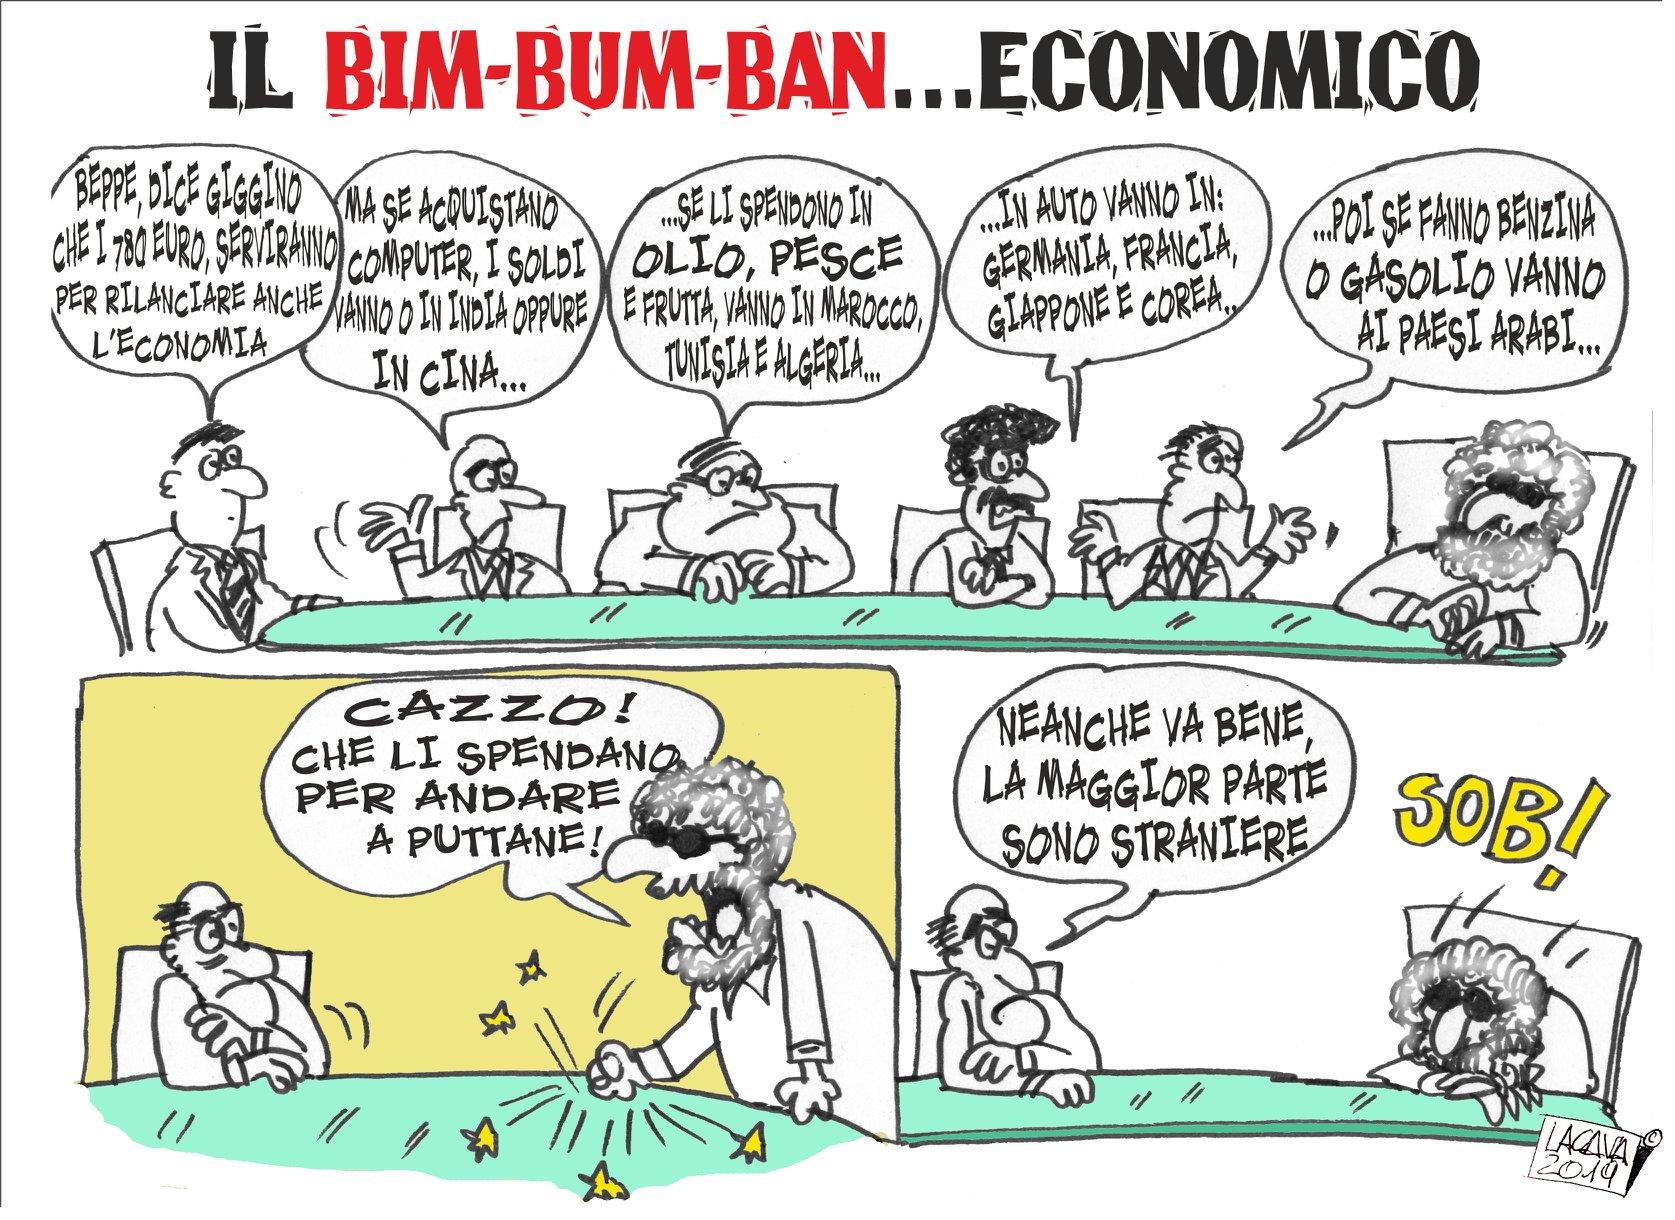 IL BIM BUM BAM ECONOMICO